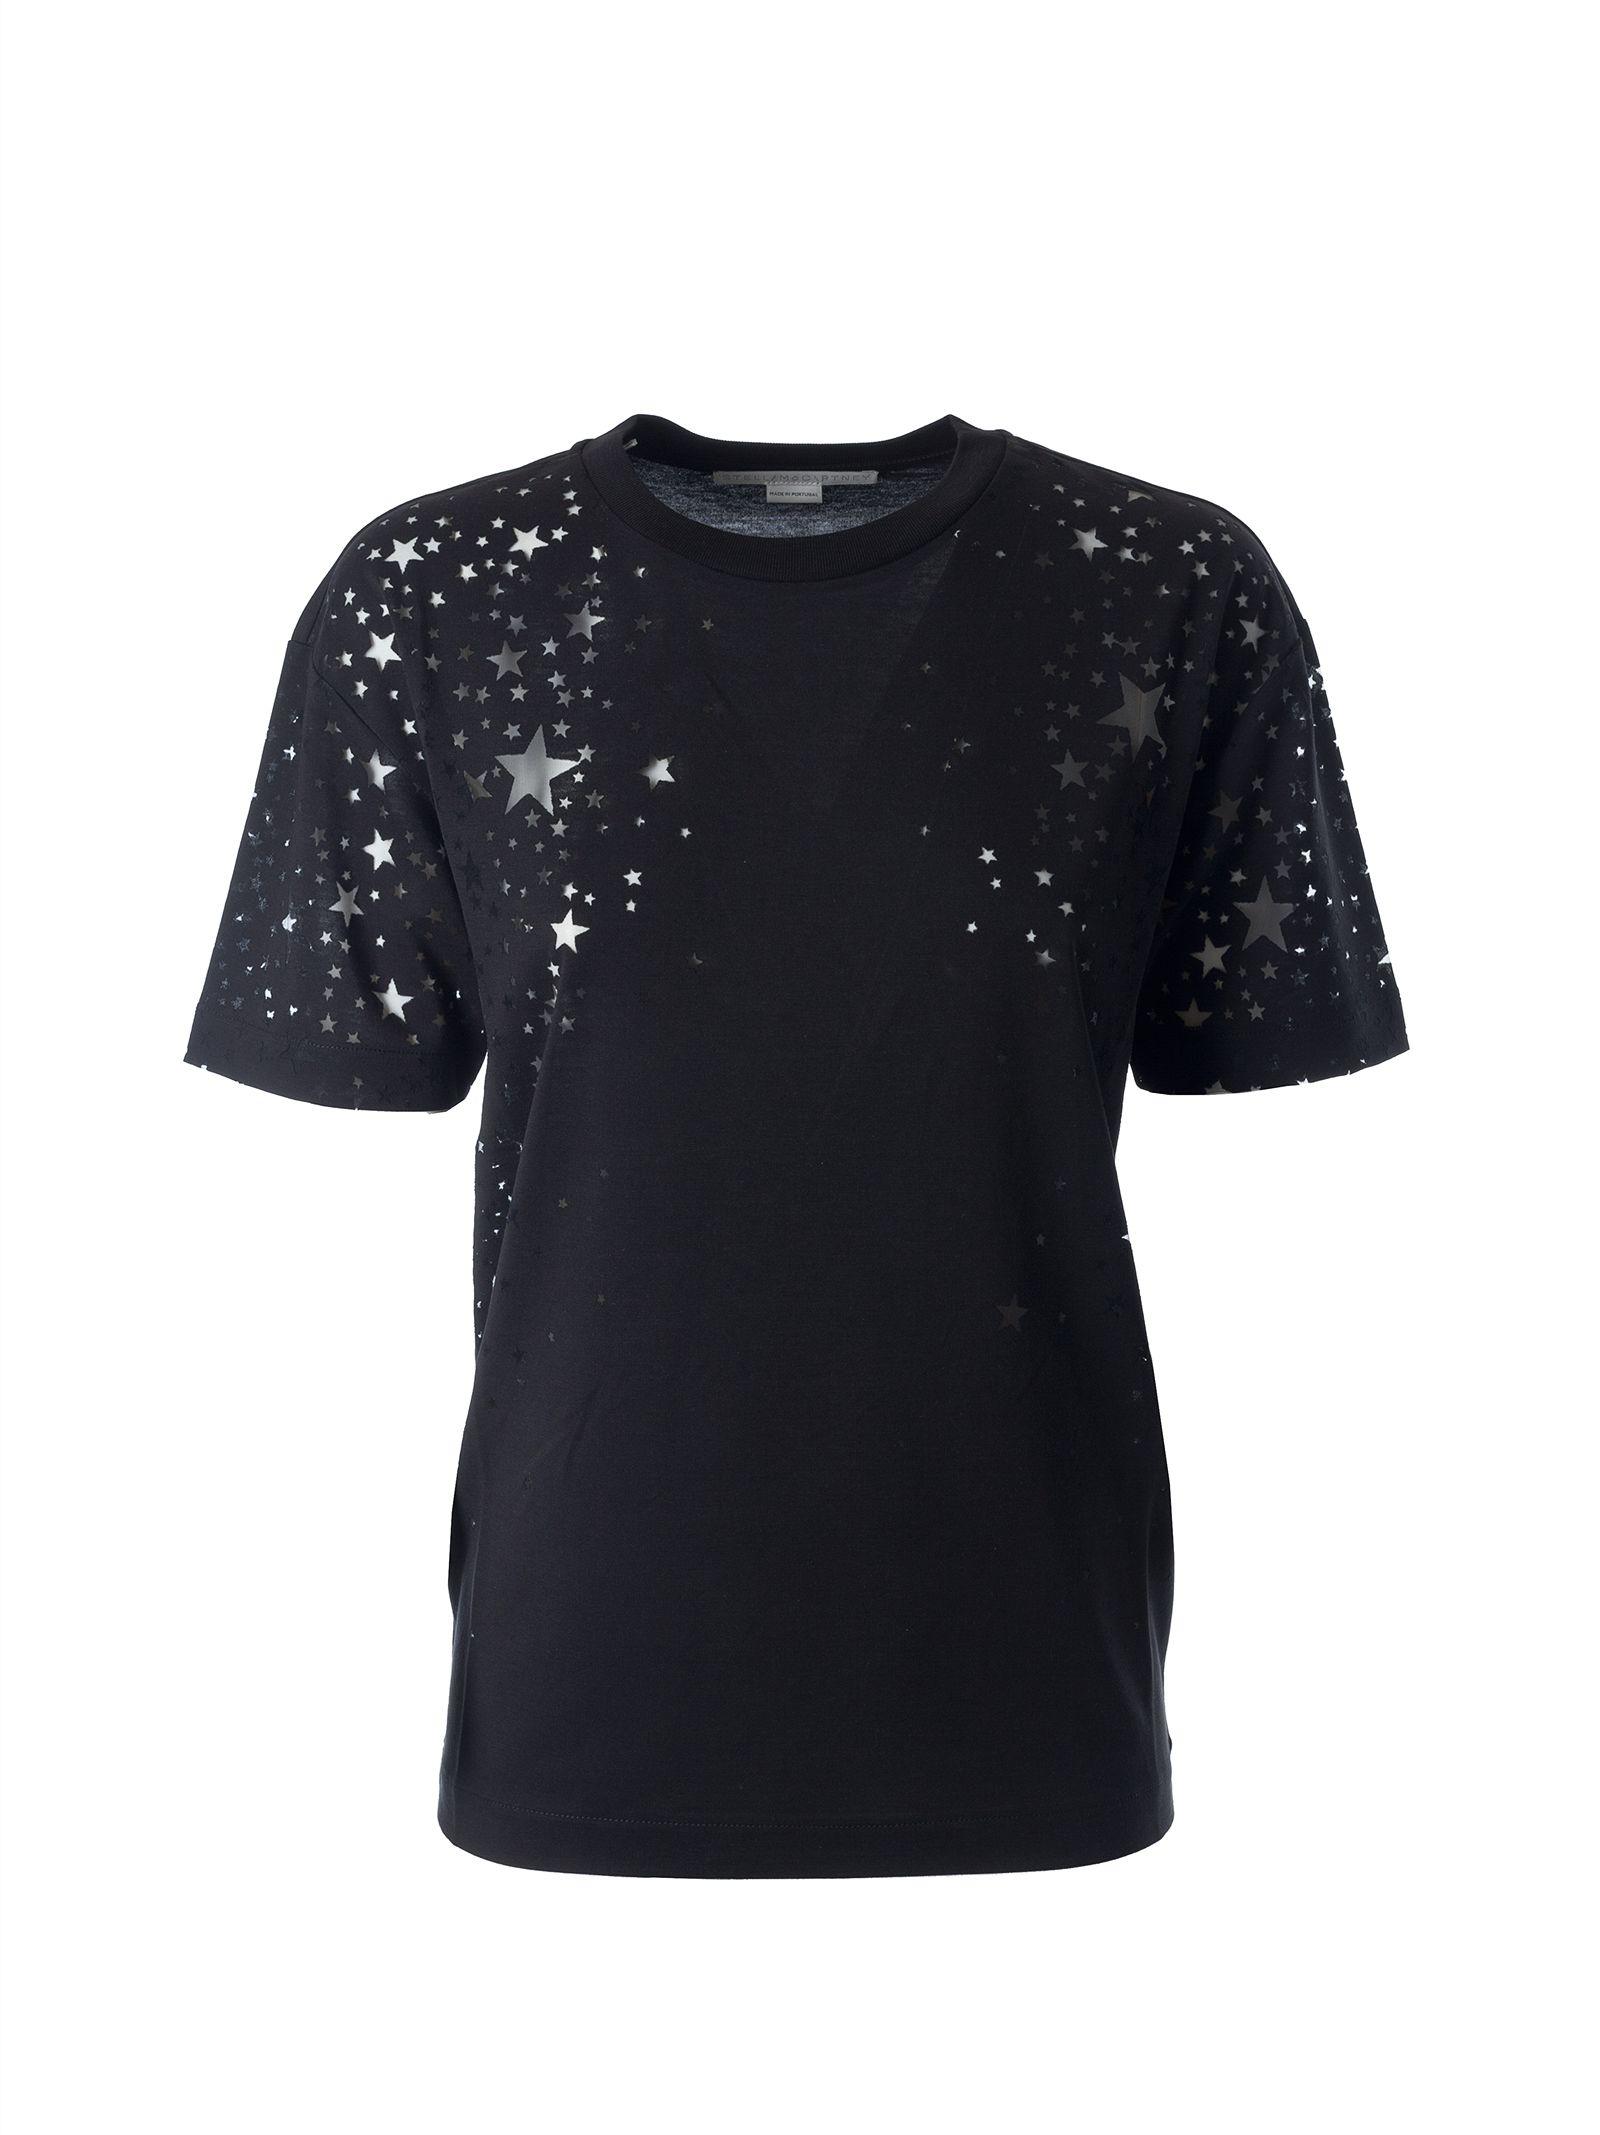 Stella Mccartney Star Panel T-shirt